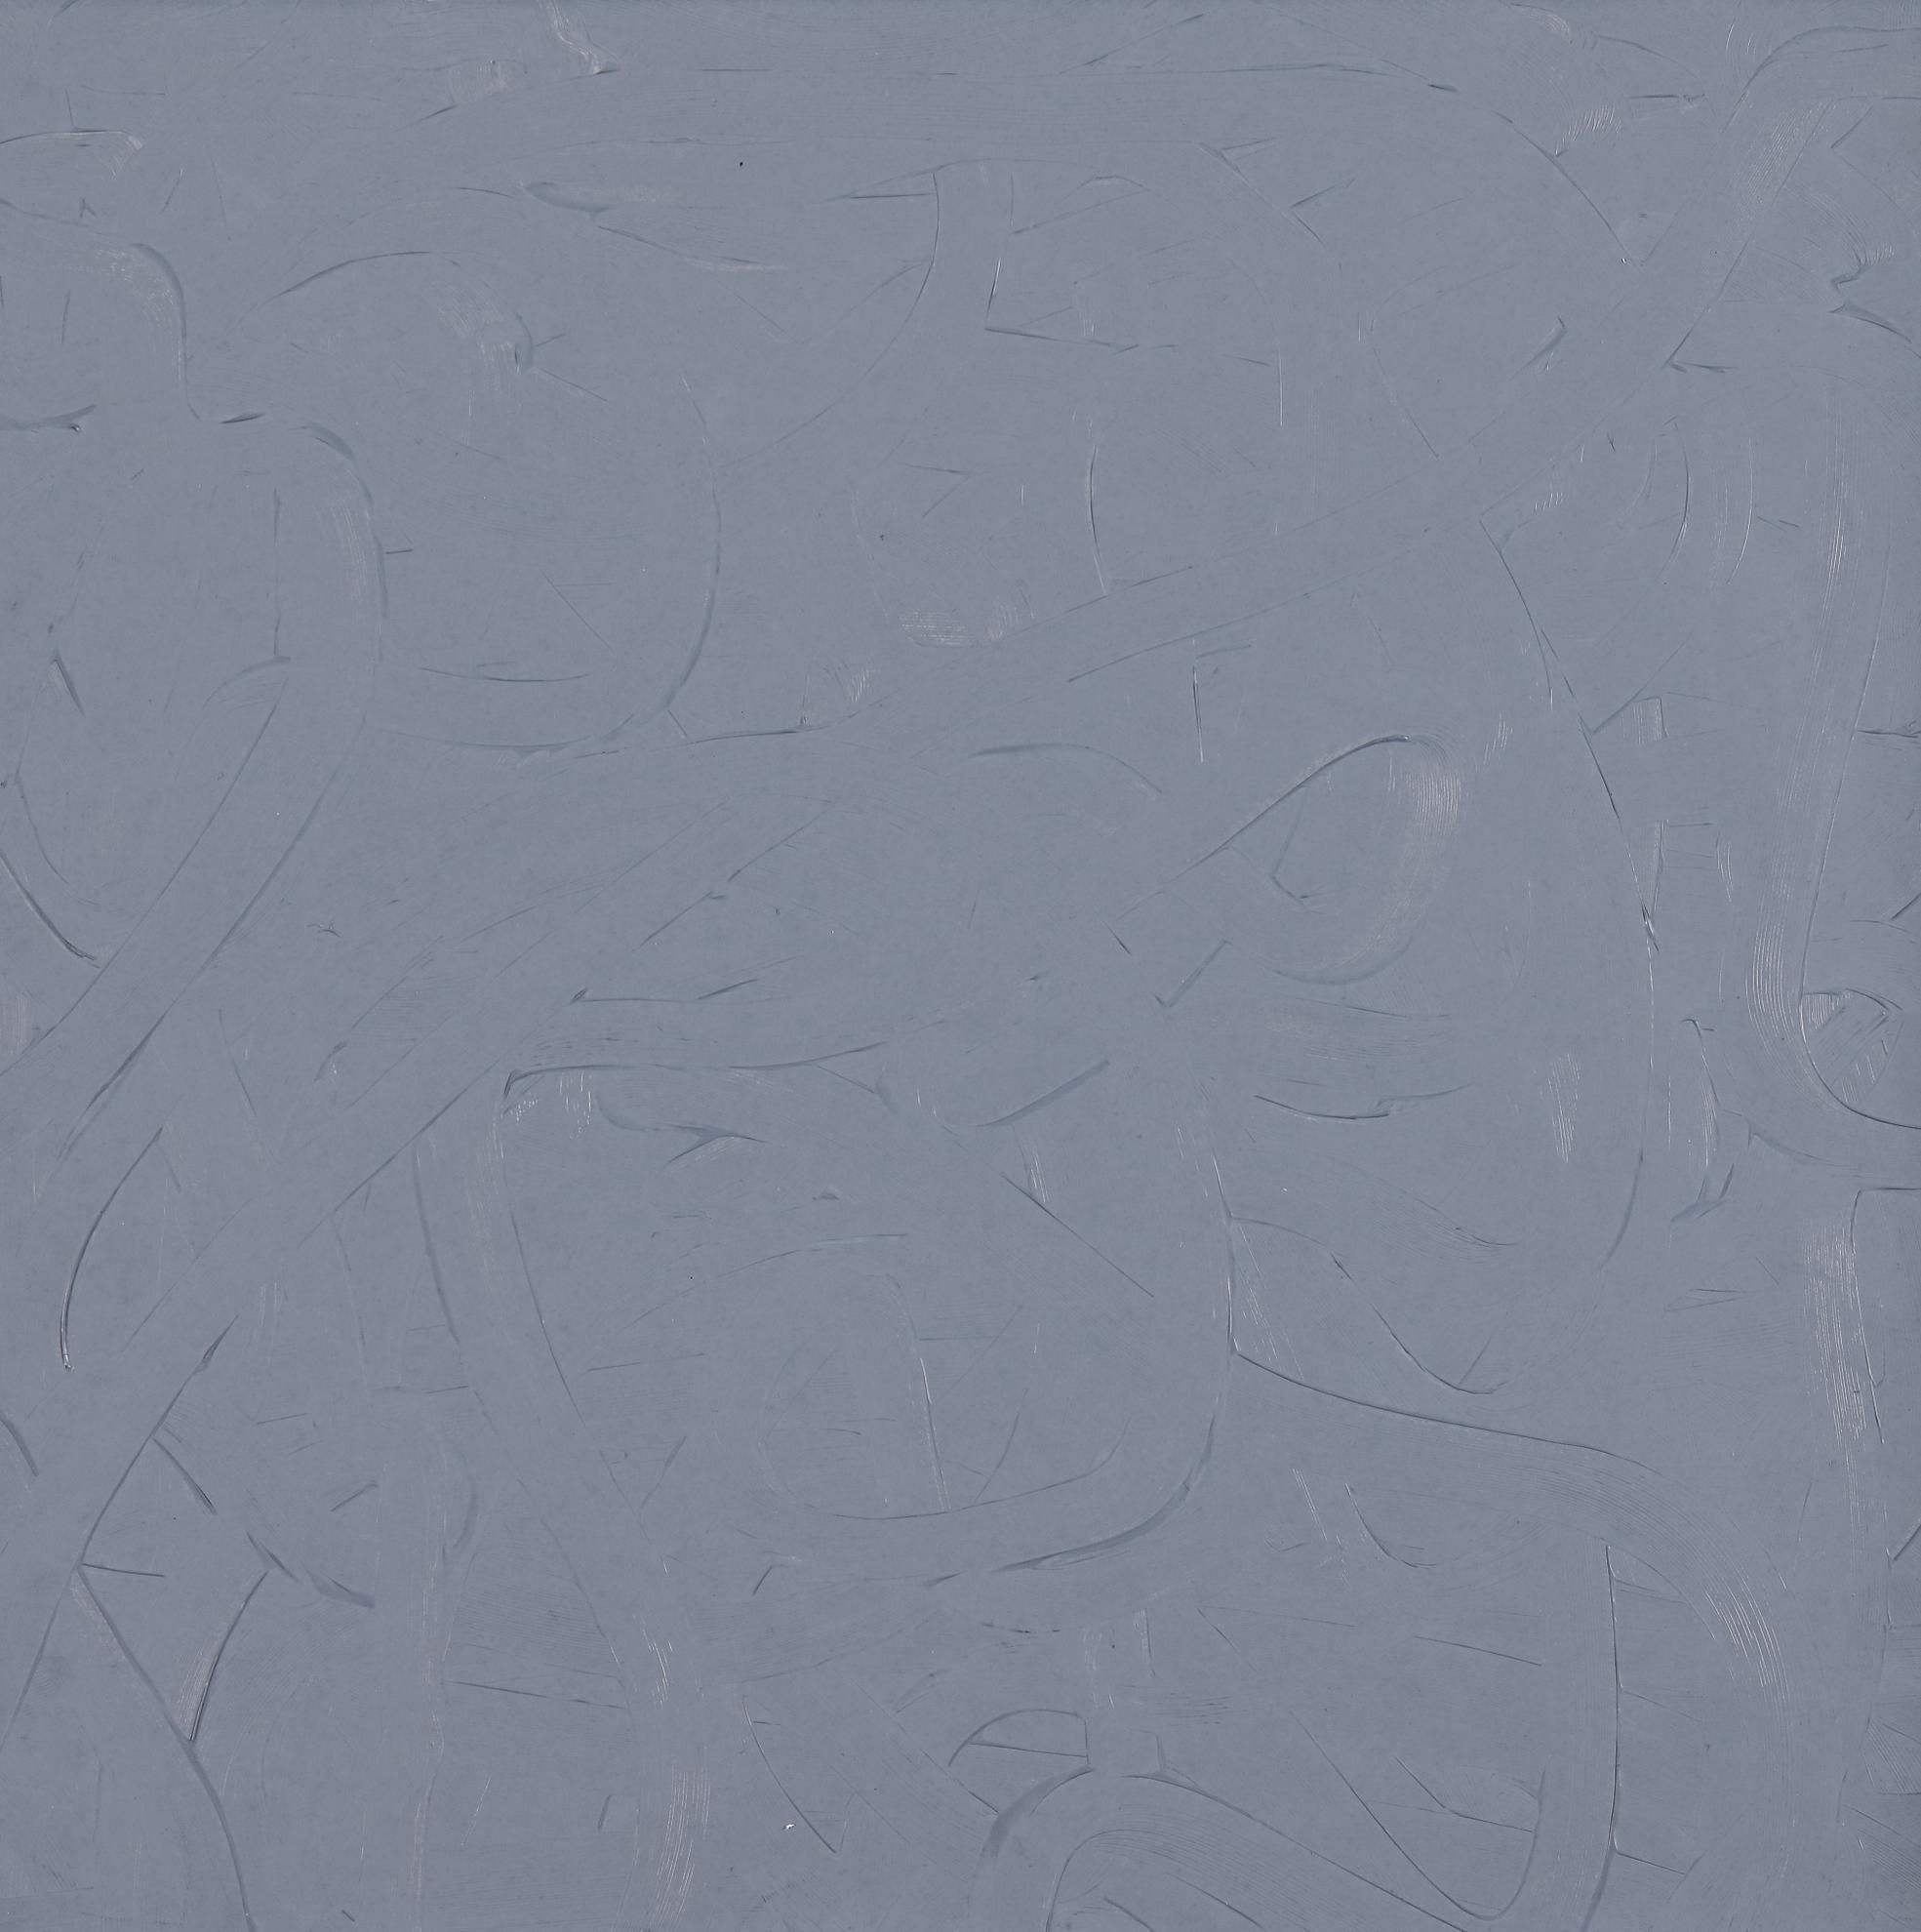 Gerhard Richter-Fingermalerei #147-1971